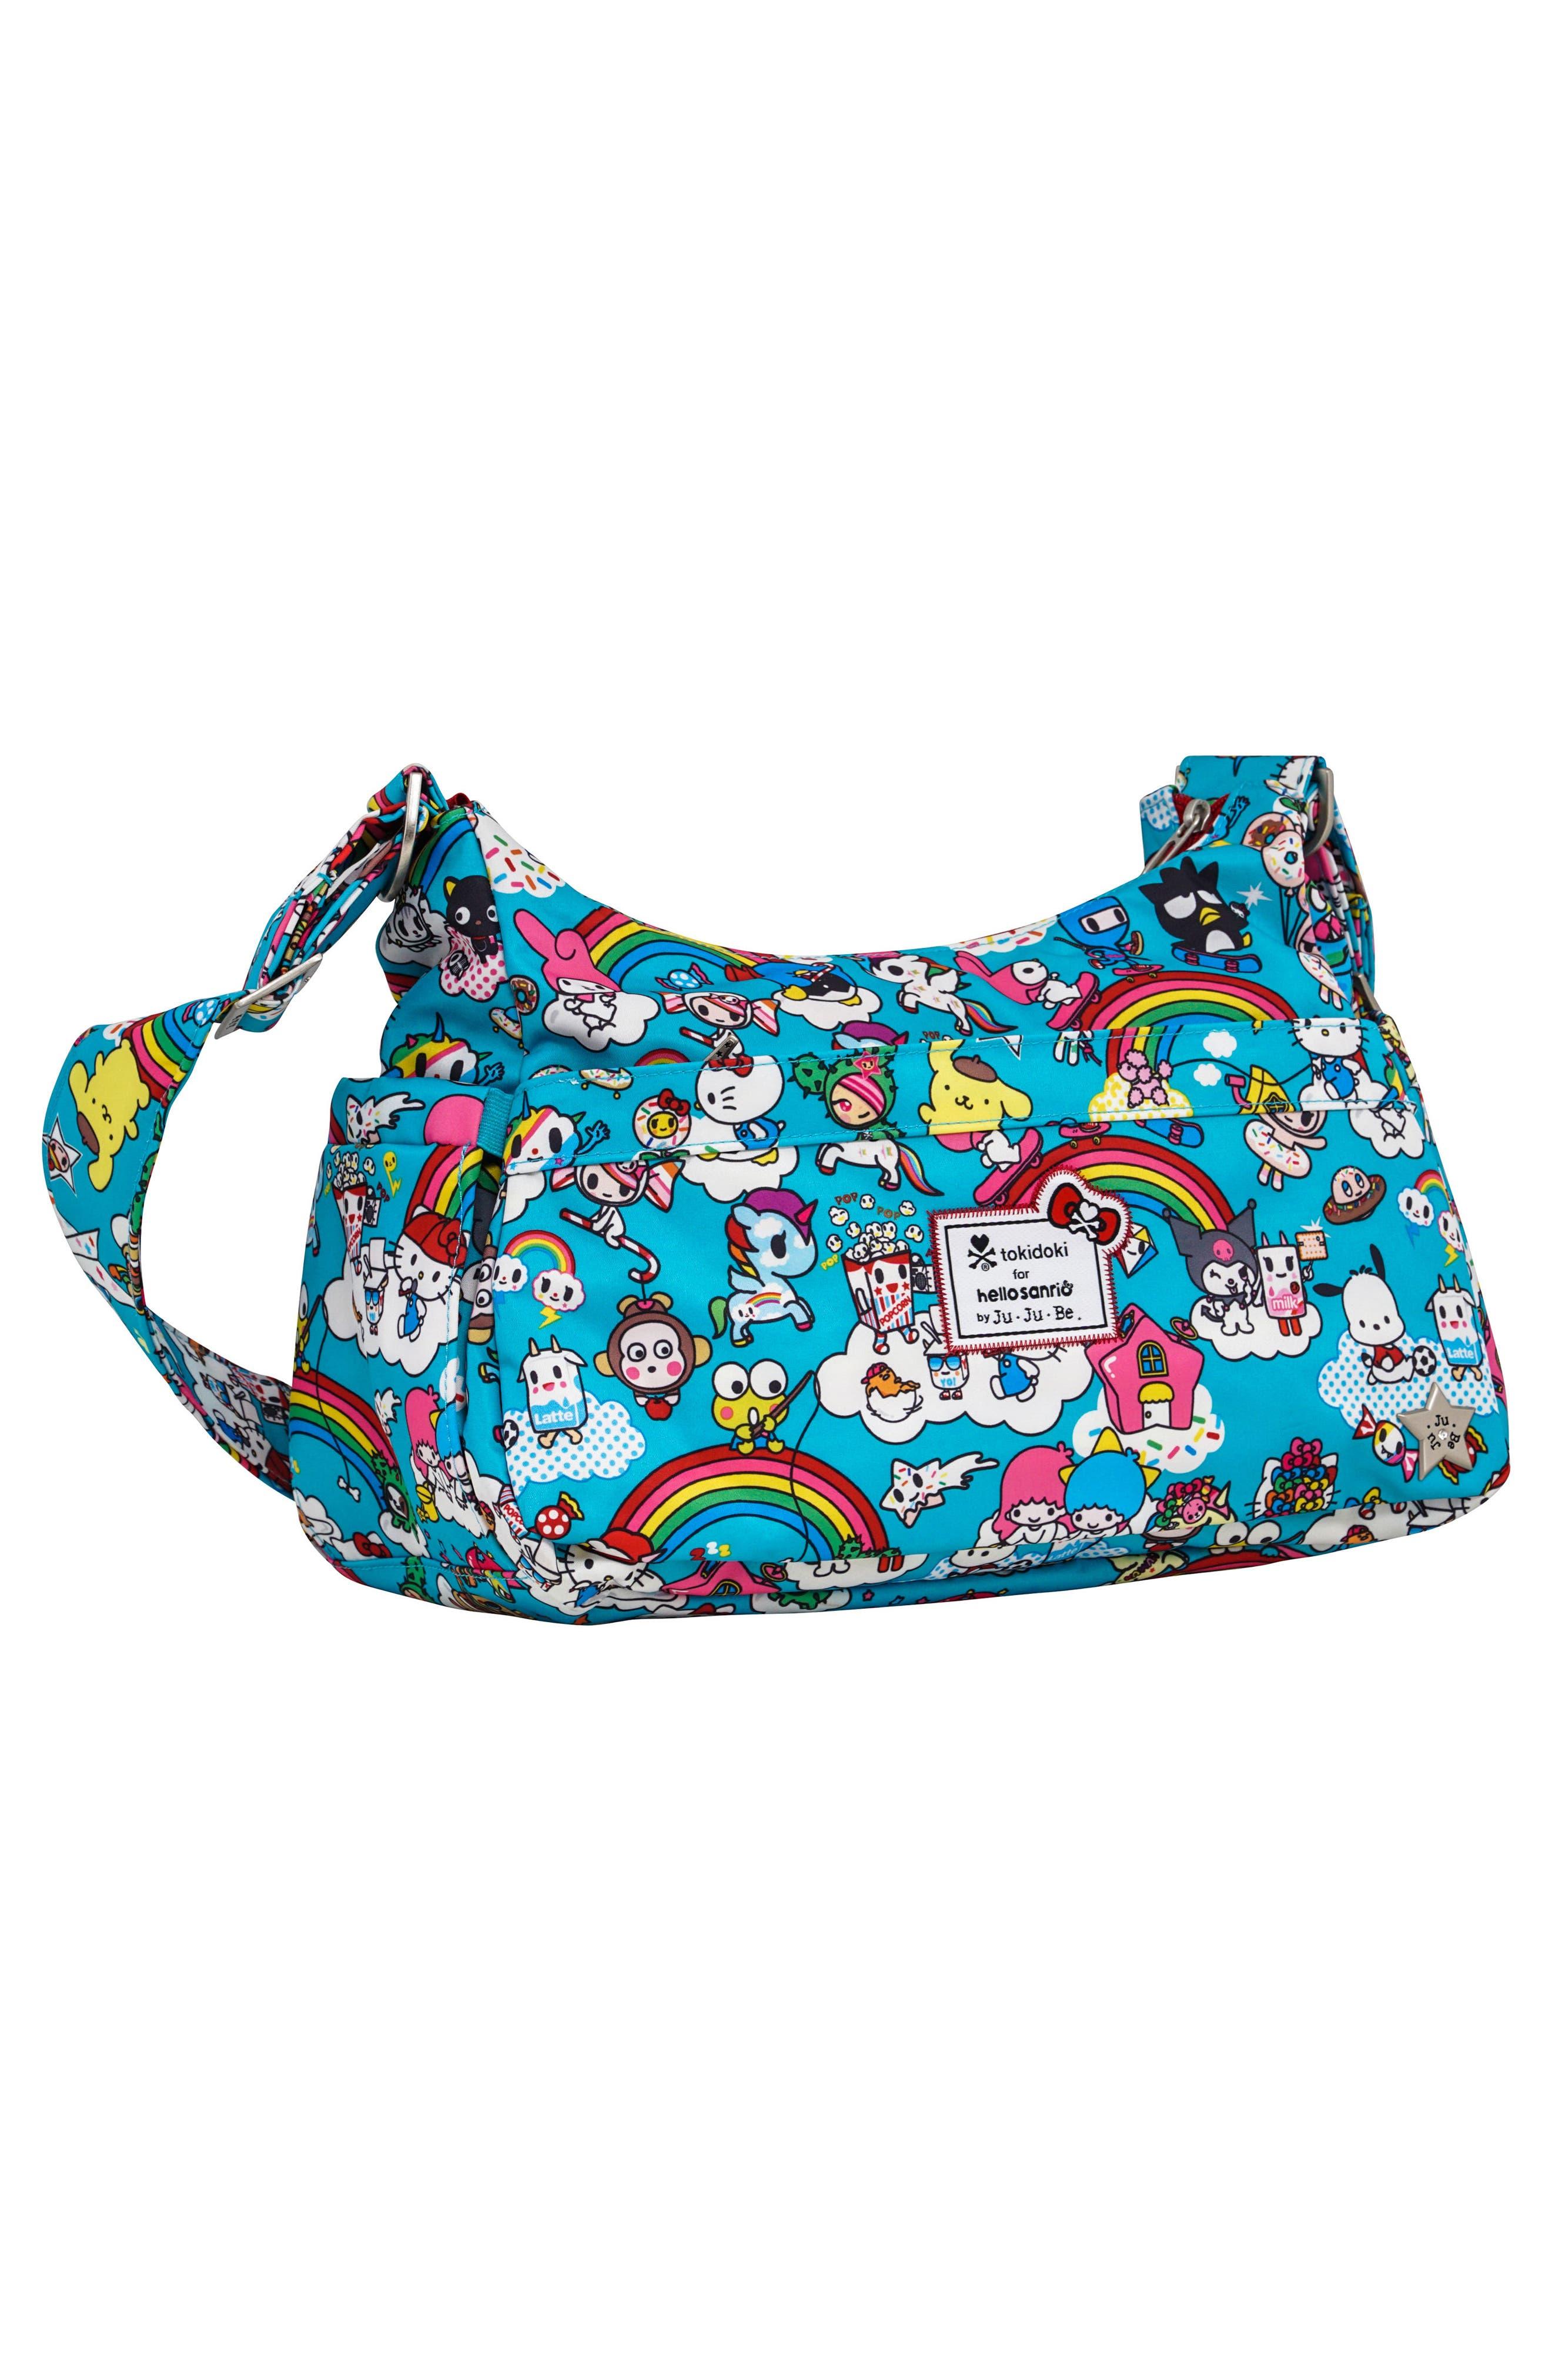 x tokidoki for Hello Sanrio Rainbow Dreams Be Hobo Diaper Bag,                             Alternate thumbnail 3, color,                             Rainbow Dreams